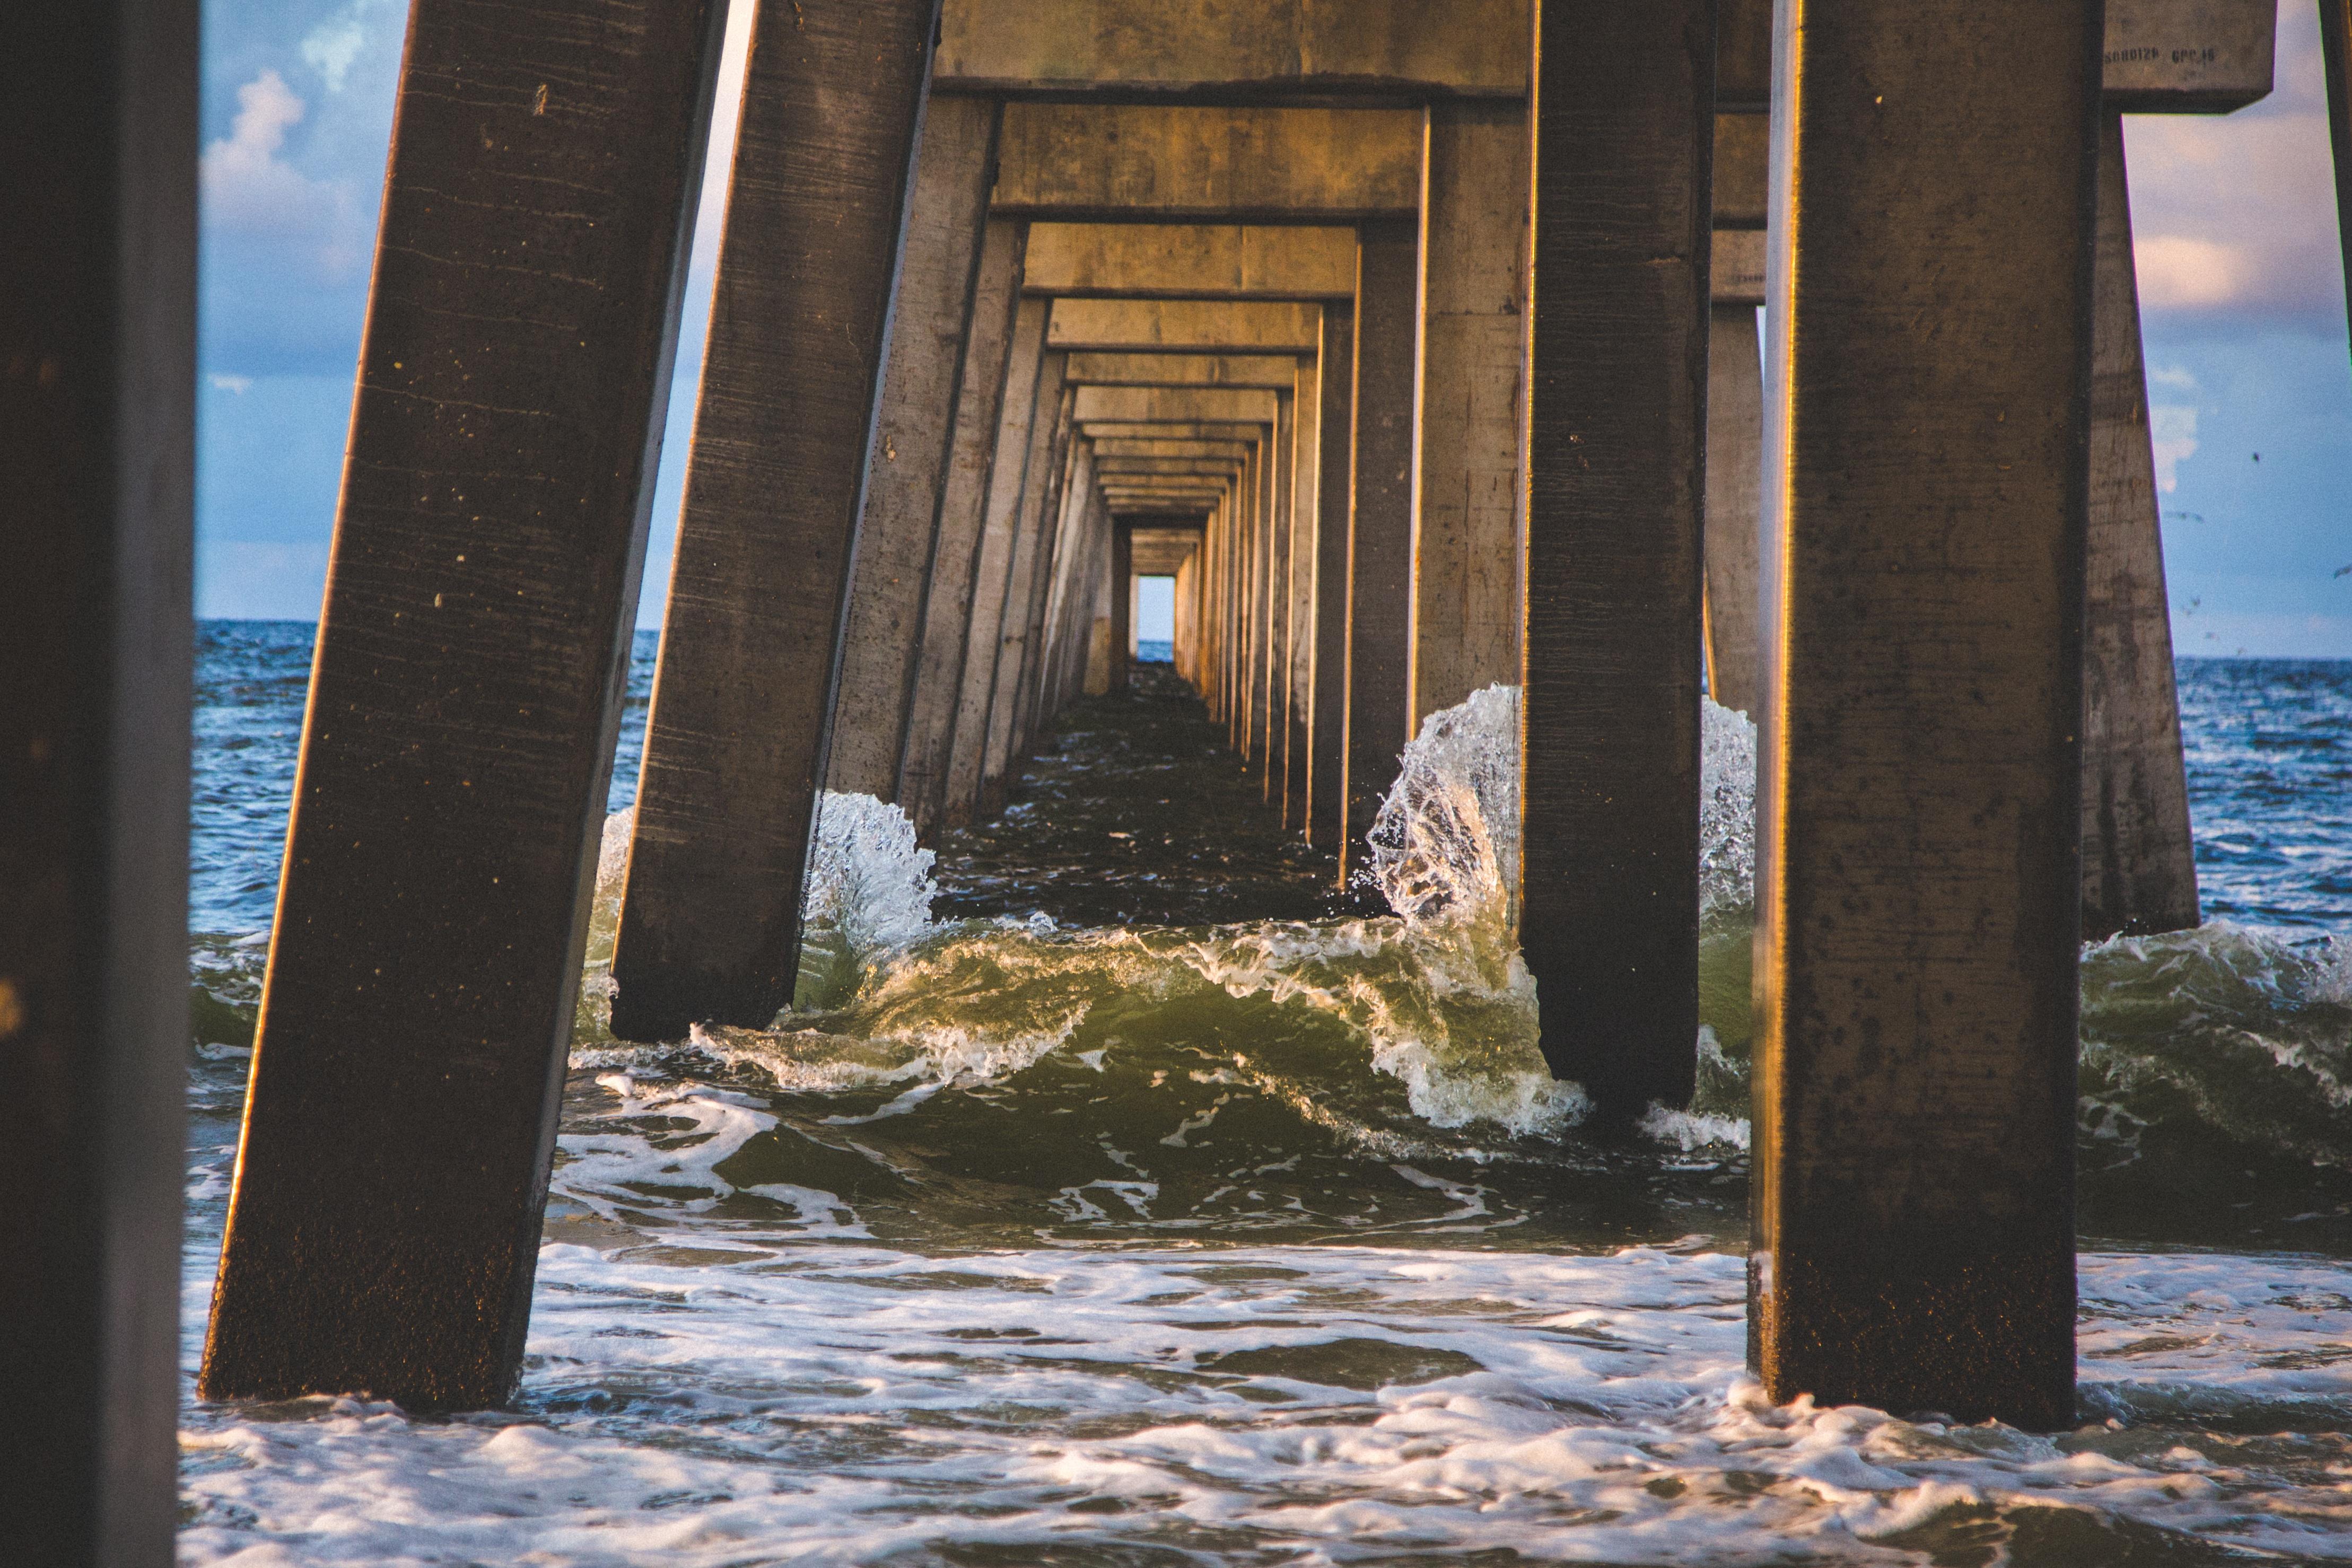 Bridge, Sea, Speed, Splash, Support, HQ Photo